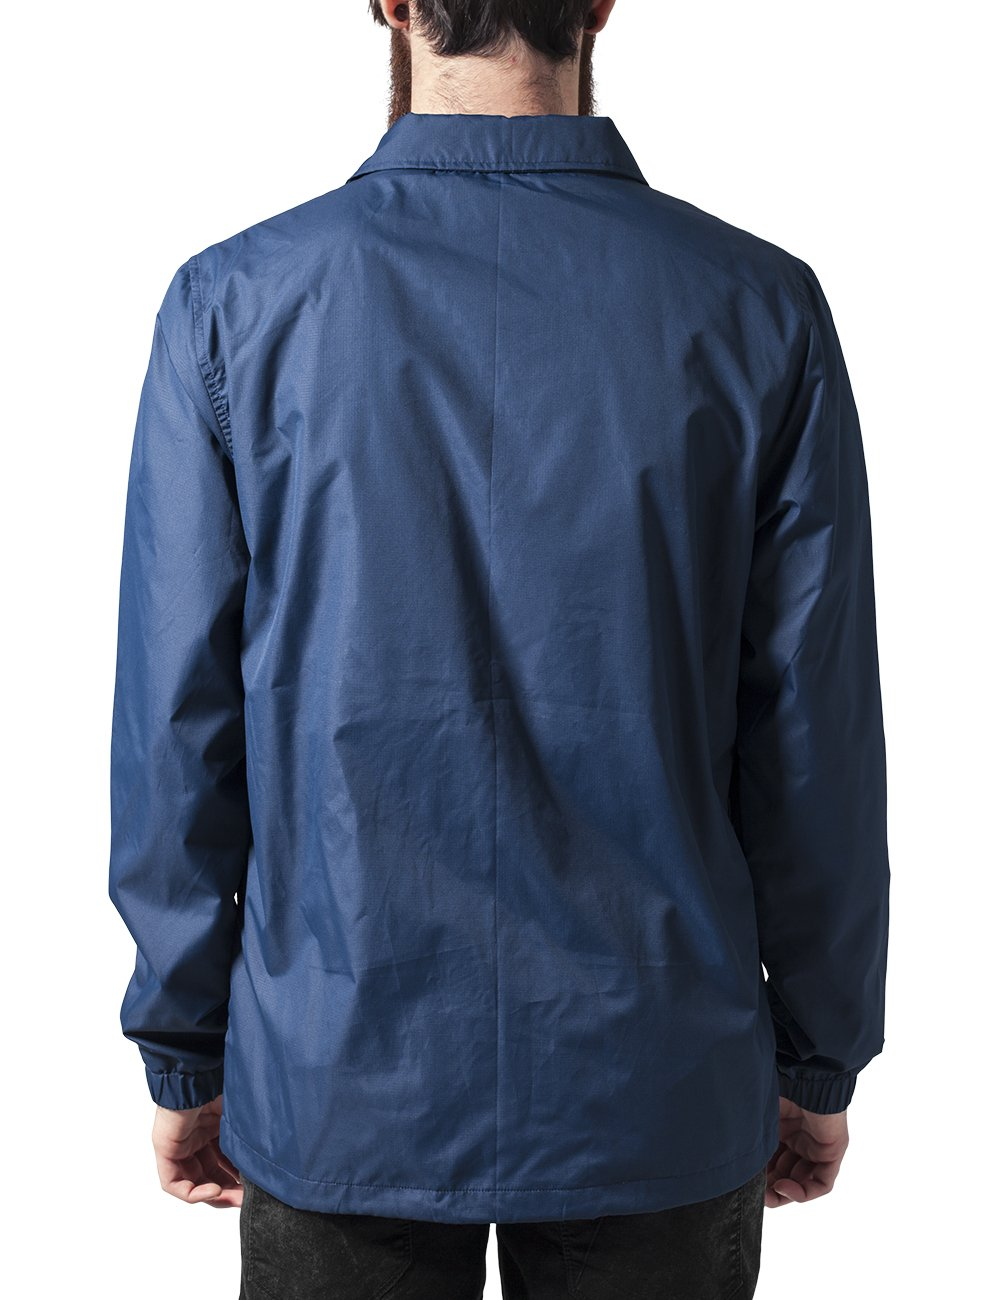 Amazon.com: Urban Classics Coach Jacket Streetwear Giacca ...